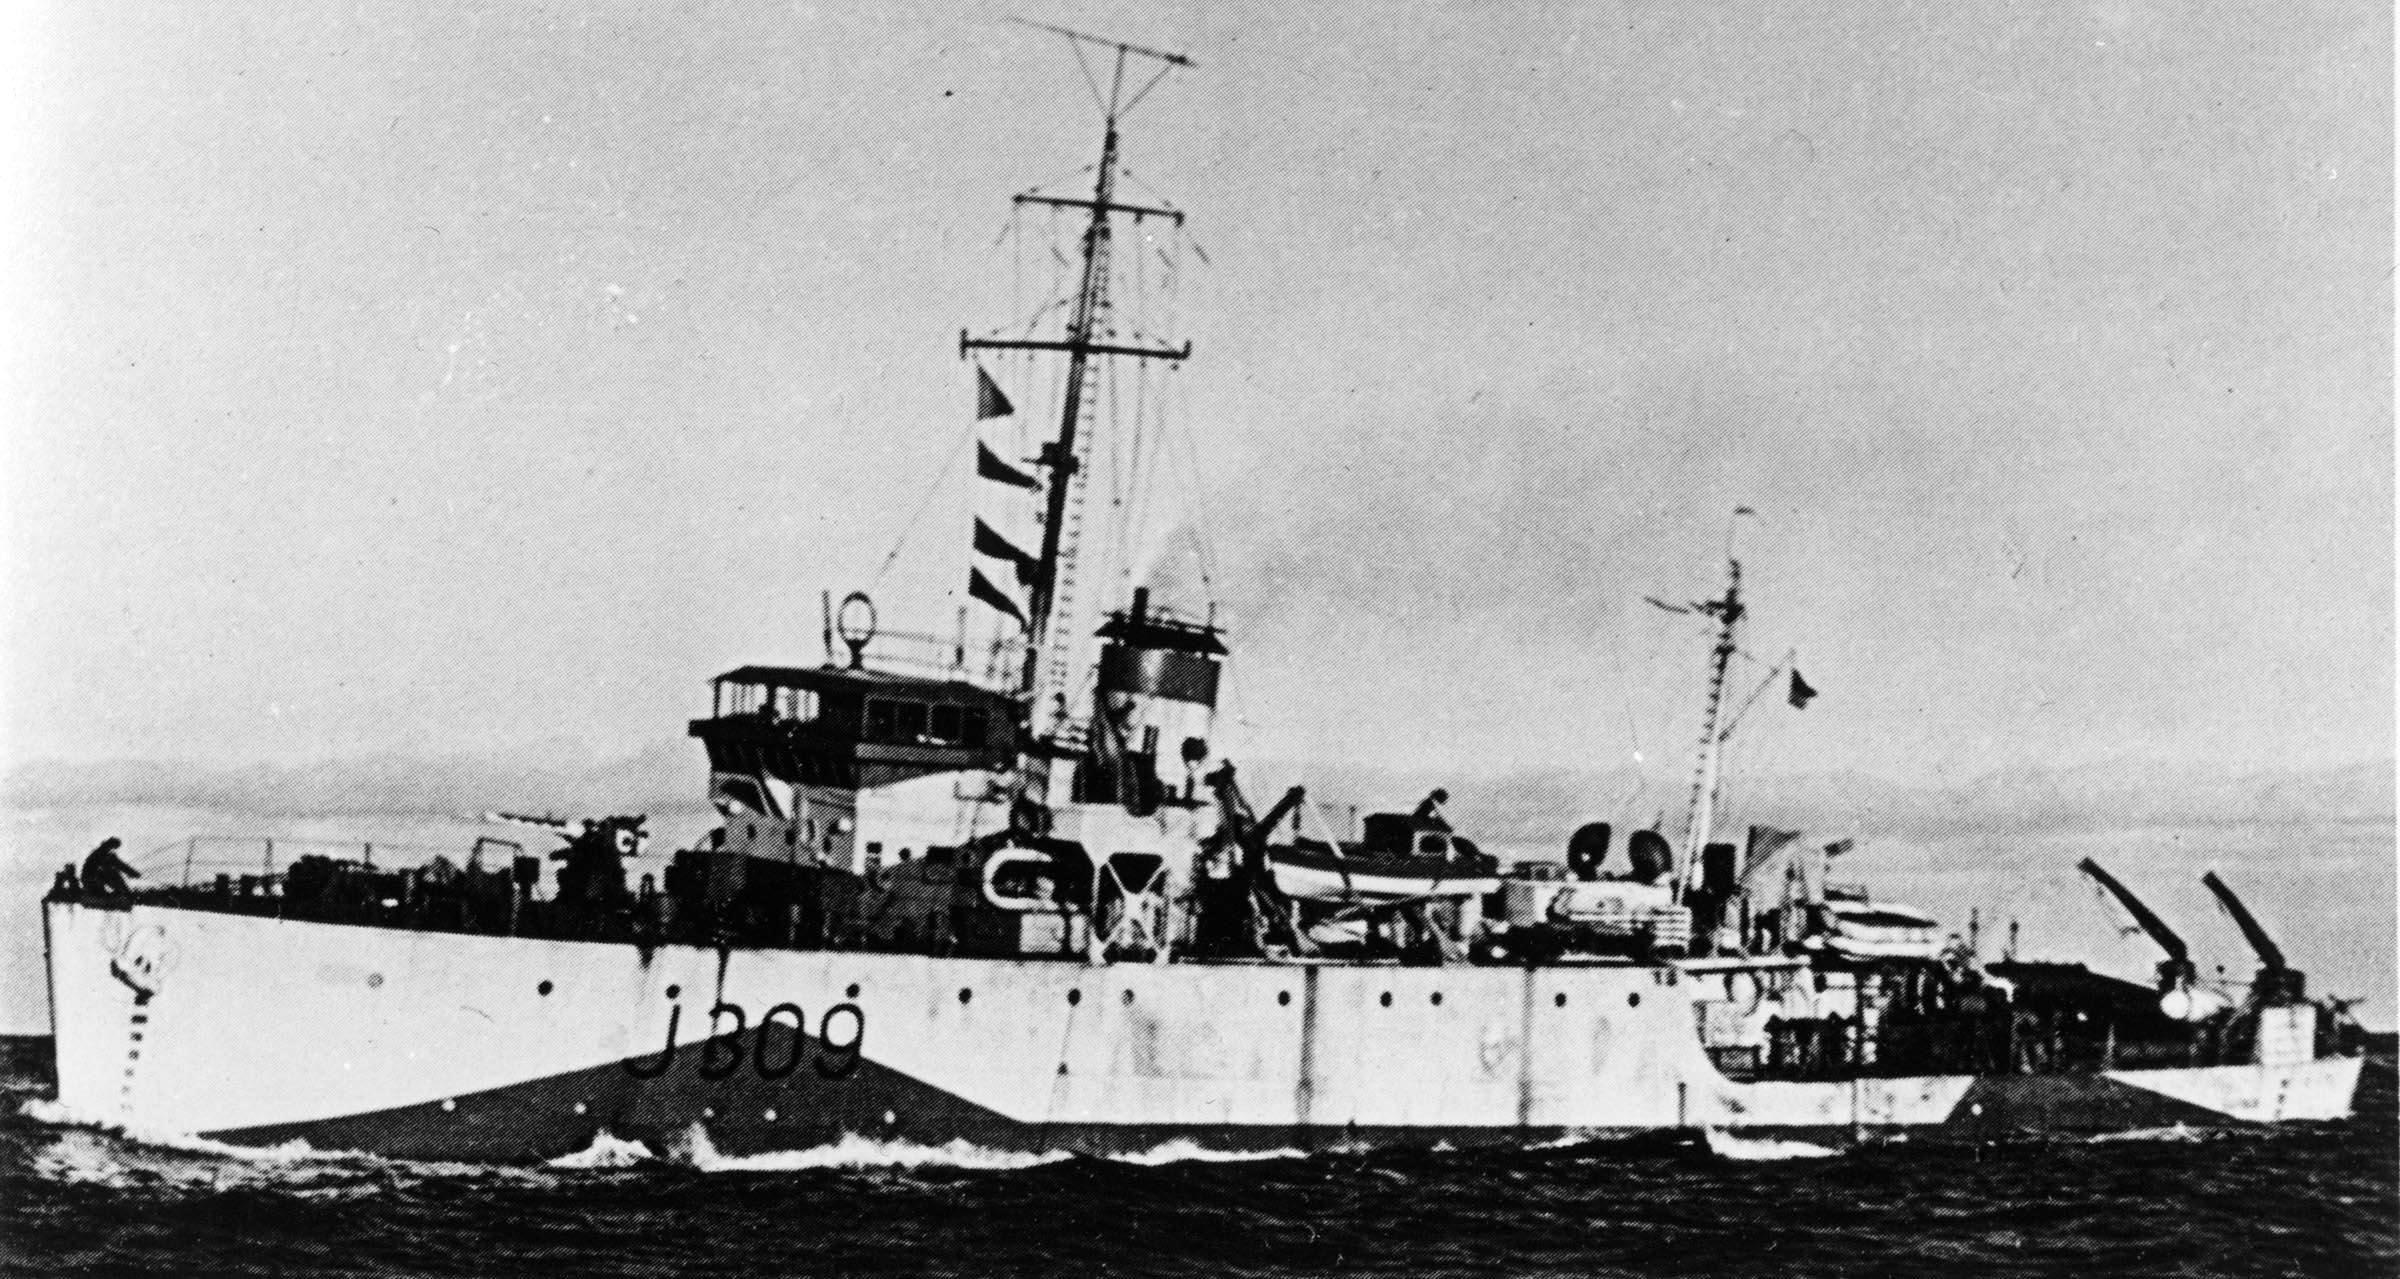 HMCS SARNIA